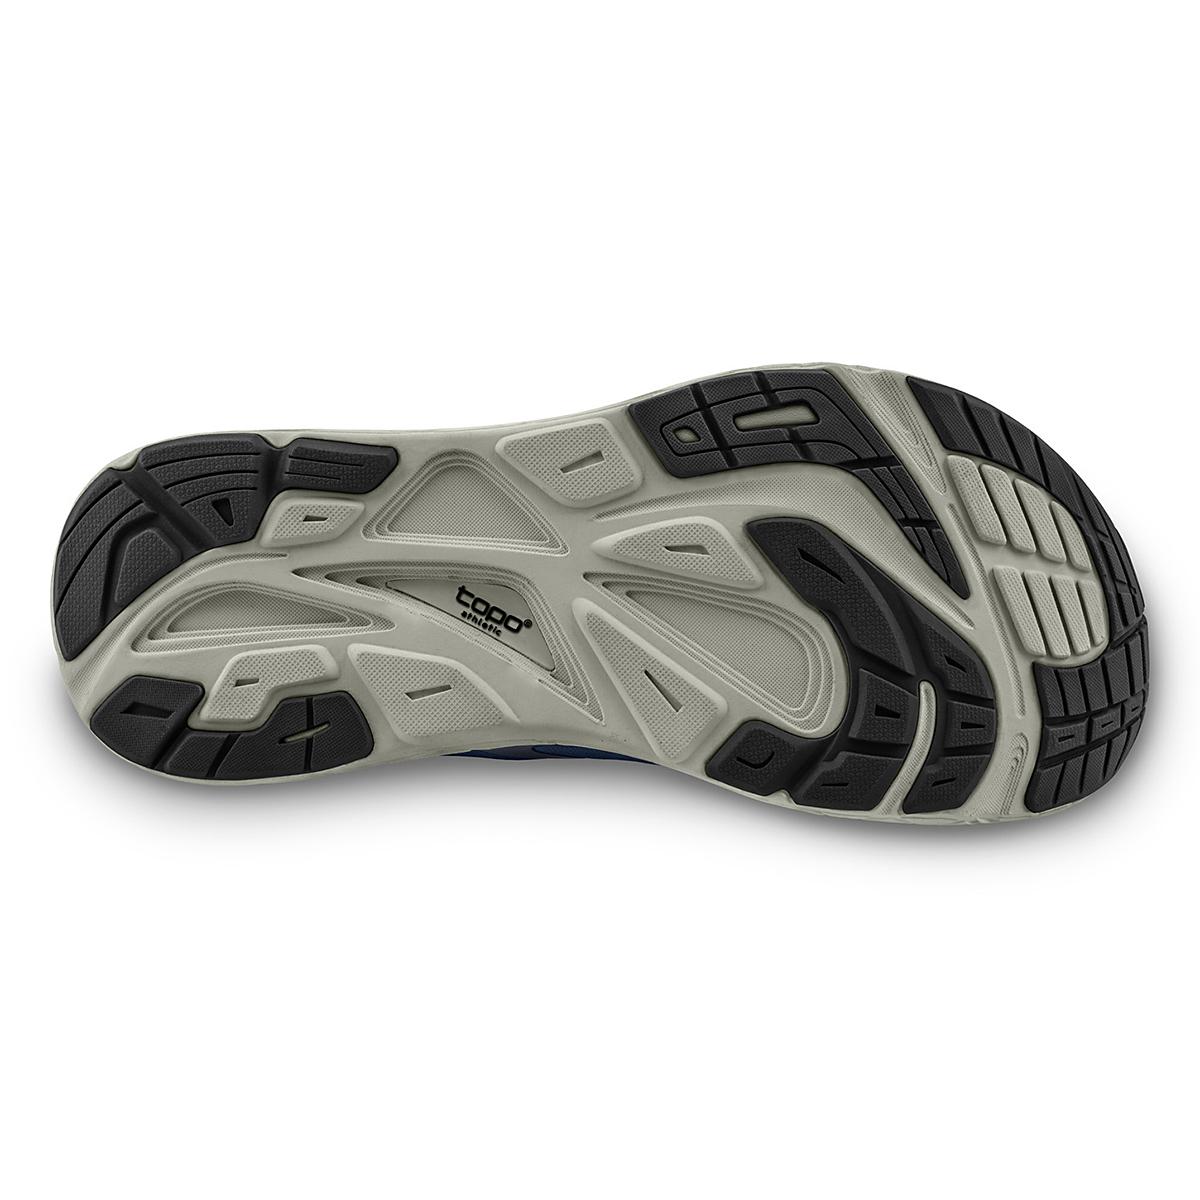 topo phantom shoe